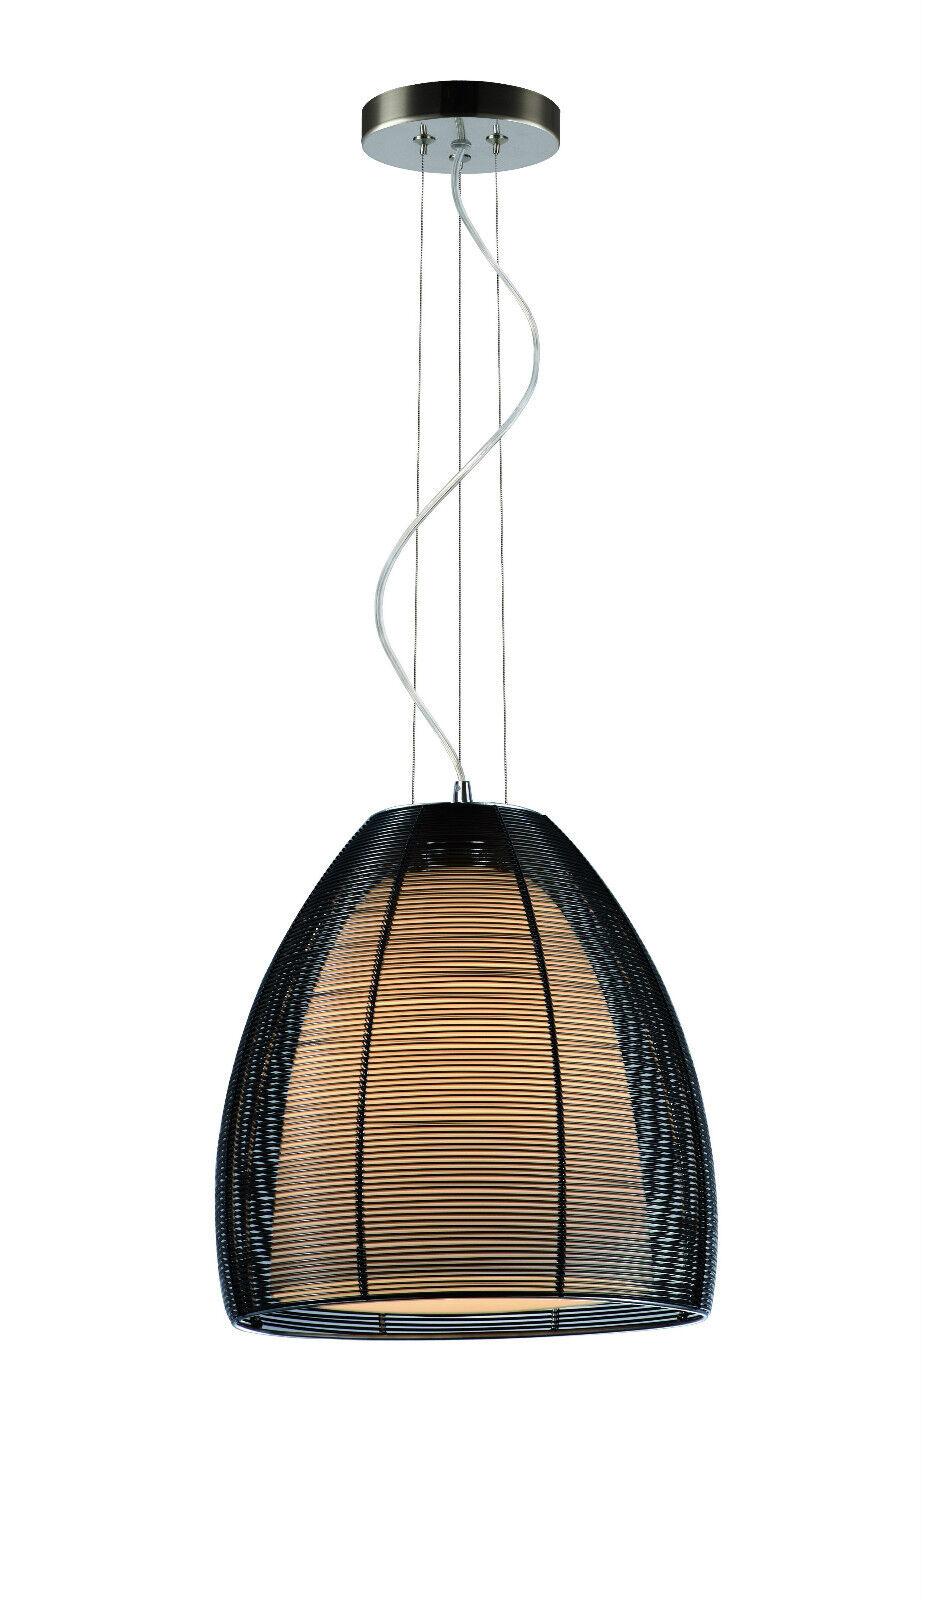 pendelleuchte drop lighting cluster drahtschirm innen. Black Bedroom Furniture Sets. Home Design Ideas